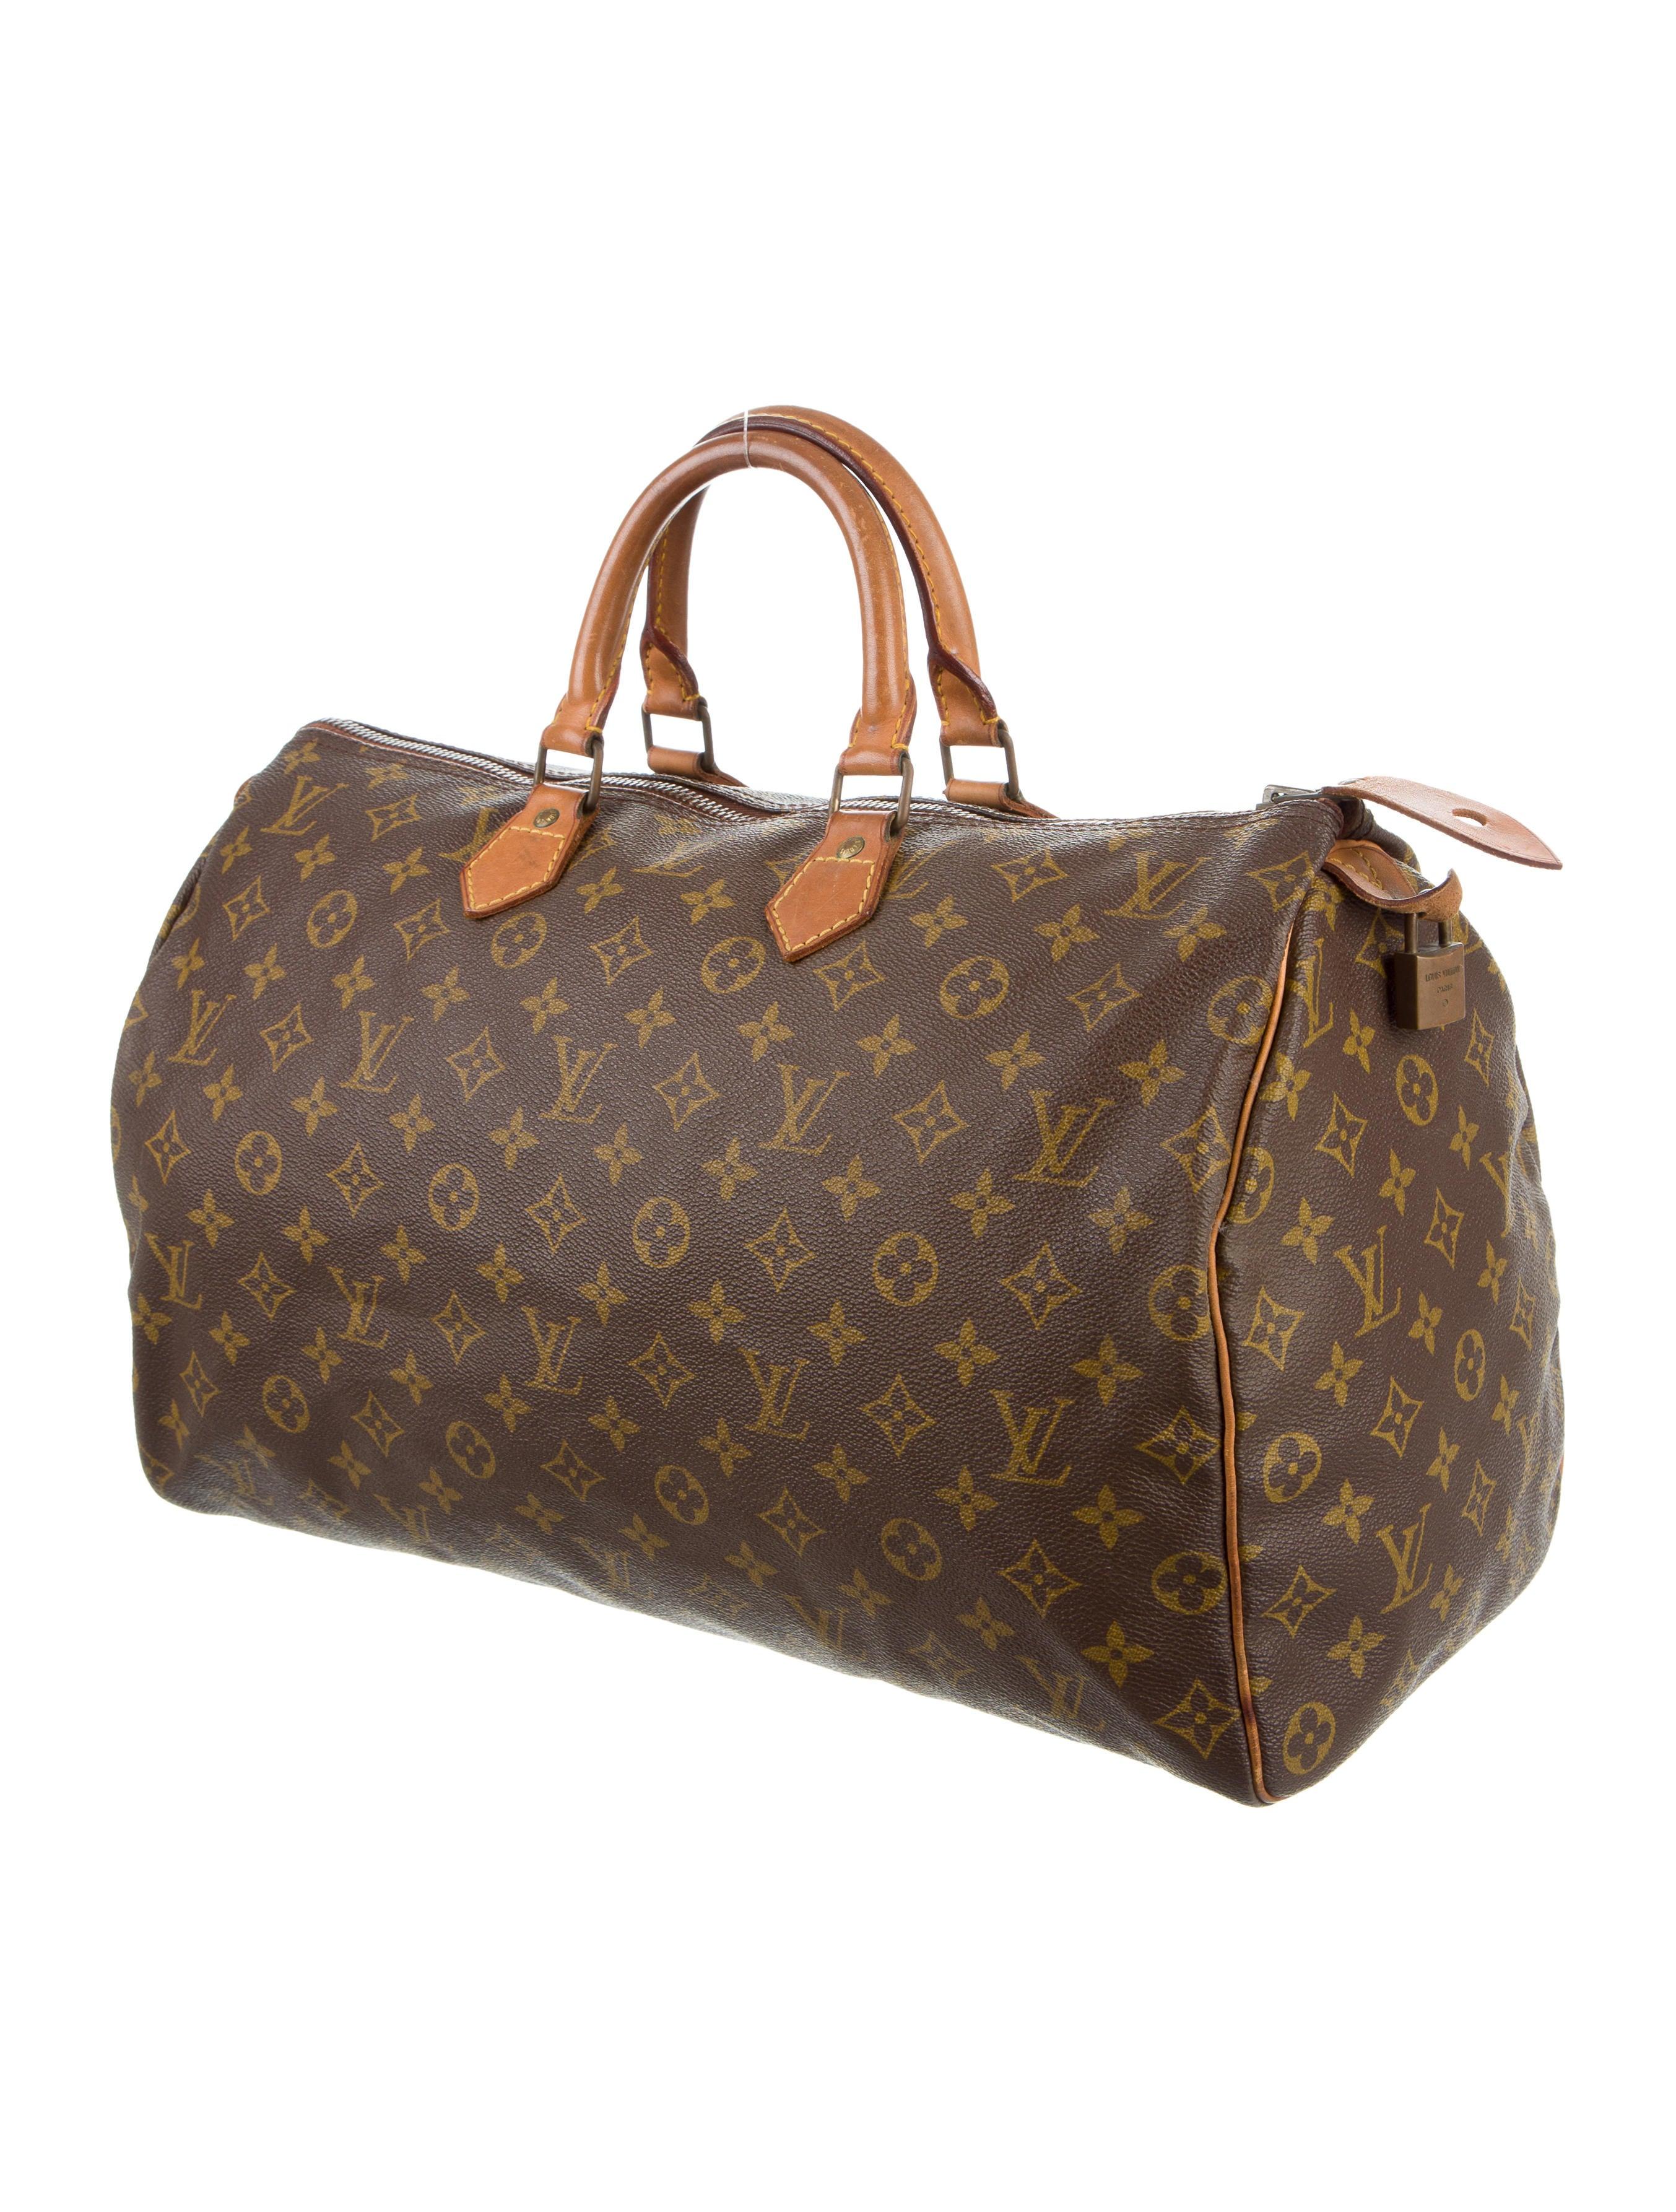 louis vuitton monogram speedy 40 handbags lou107146 the realreal. Black Bedroom Furniture Sets. Home Design Ideas